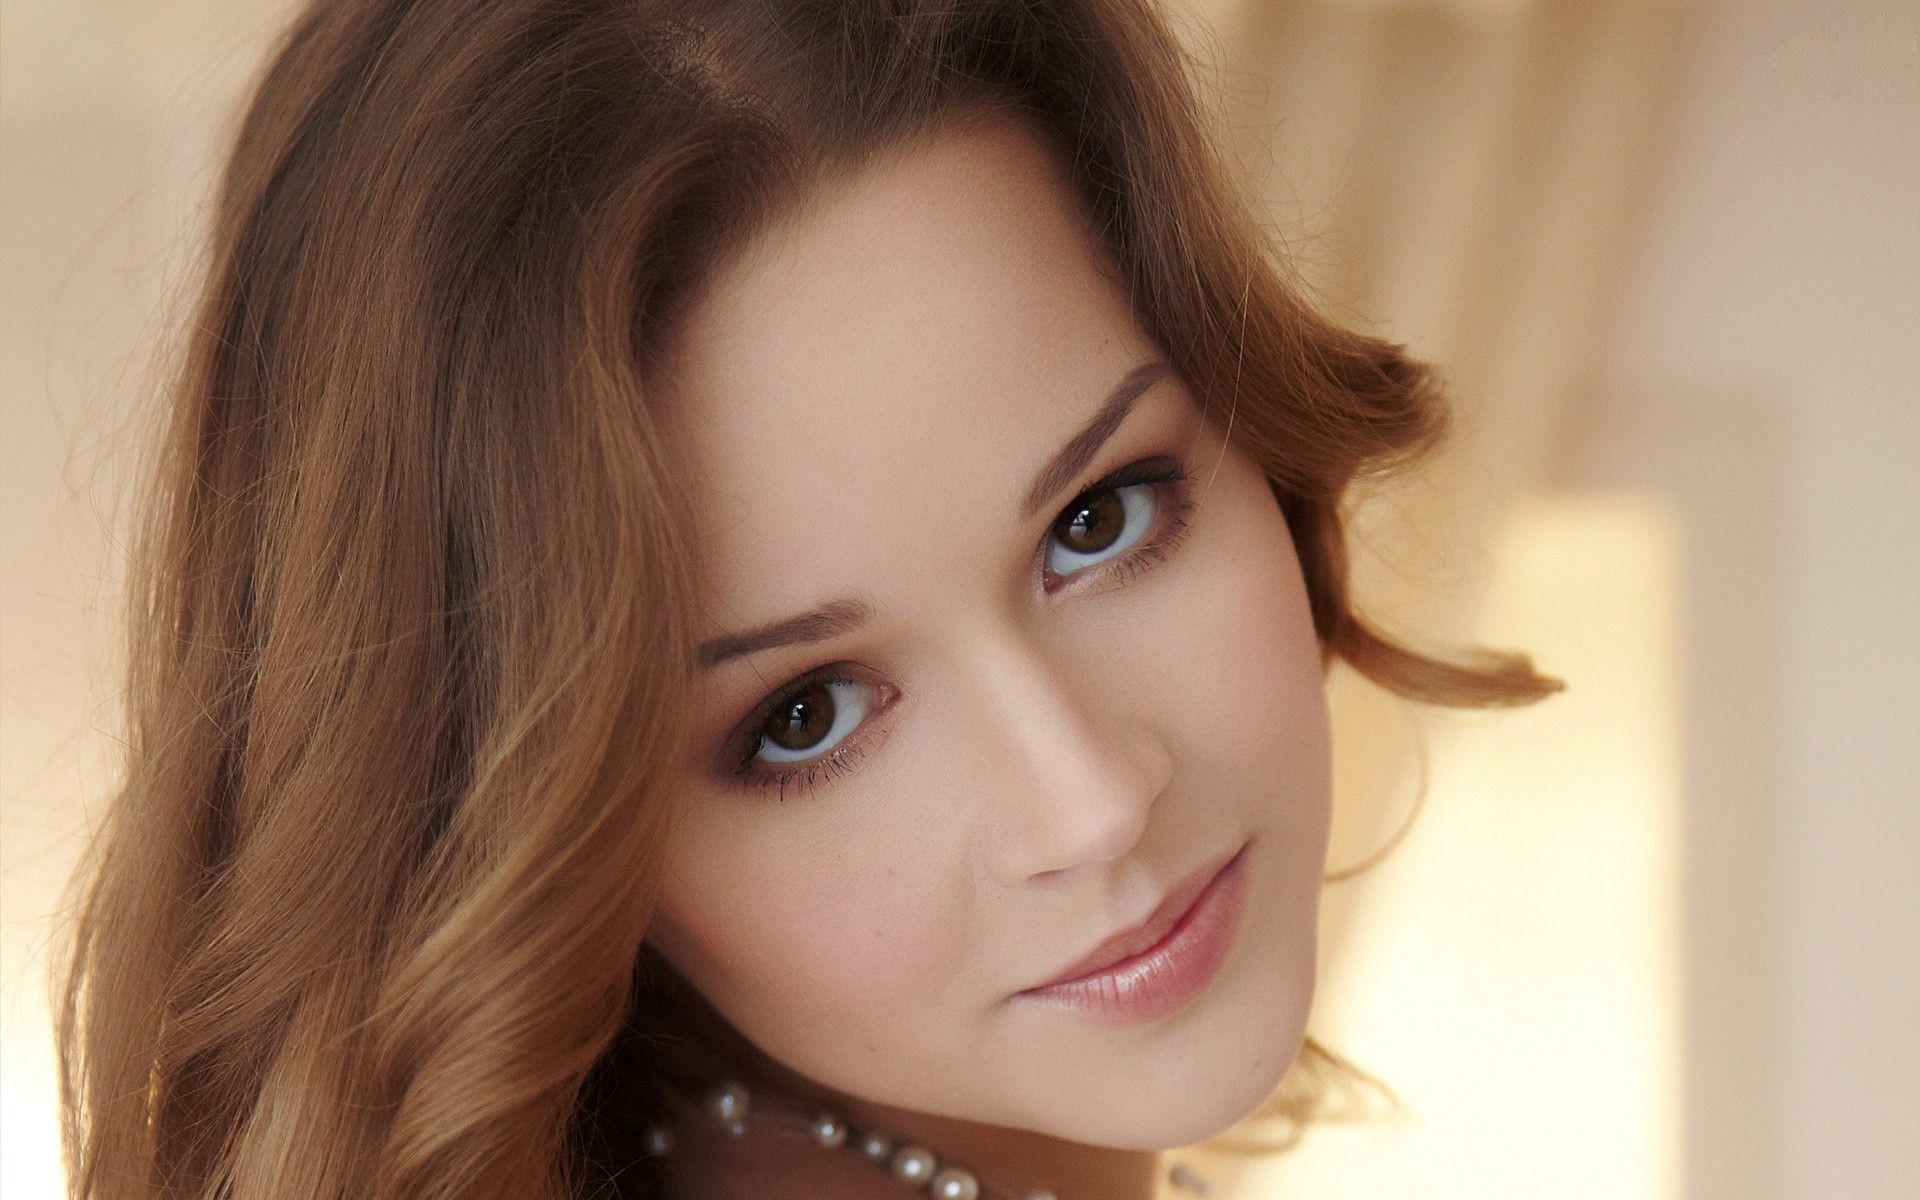 Beautiful Girl Hd Wallpapers 1080p Images.